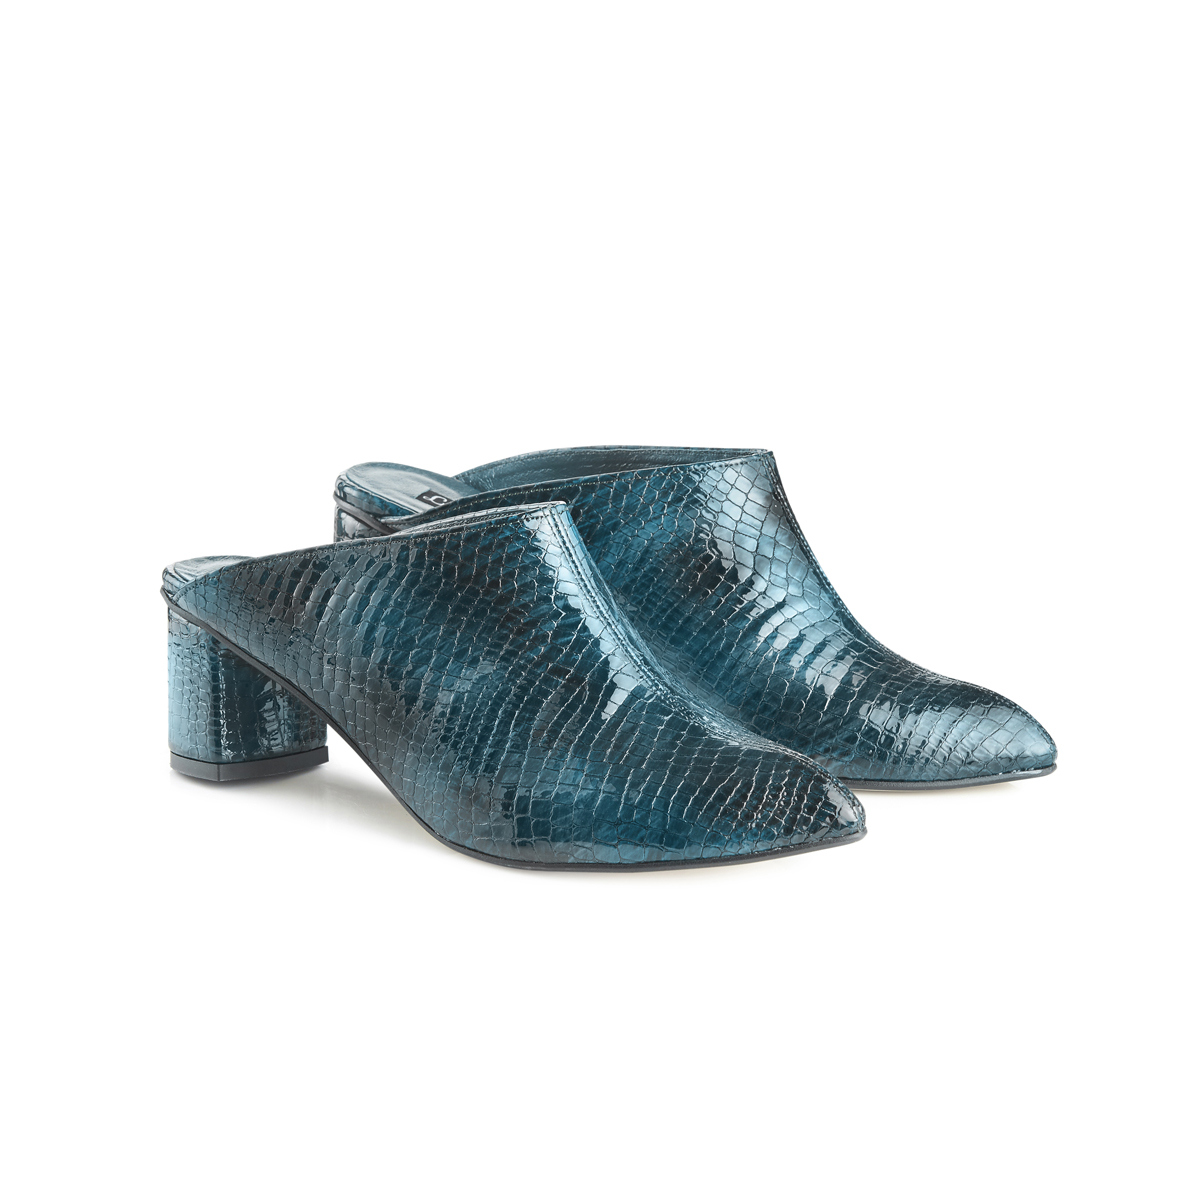 Lou croc leather block heel mules - teal